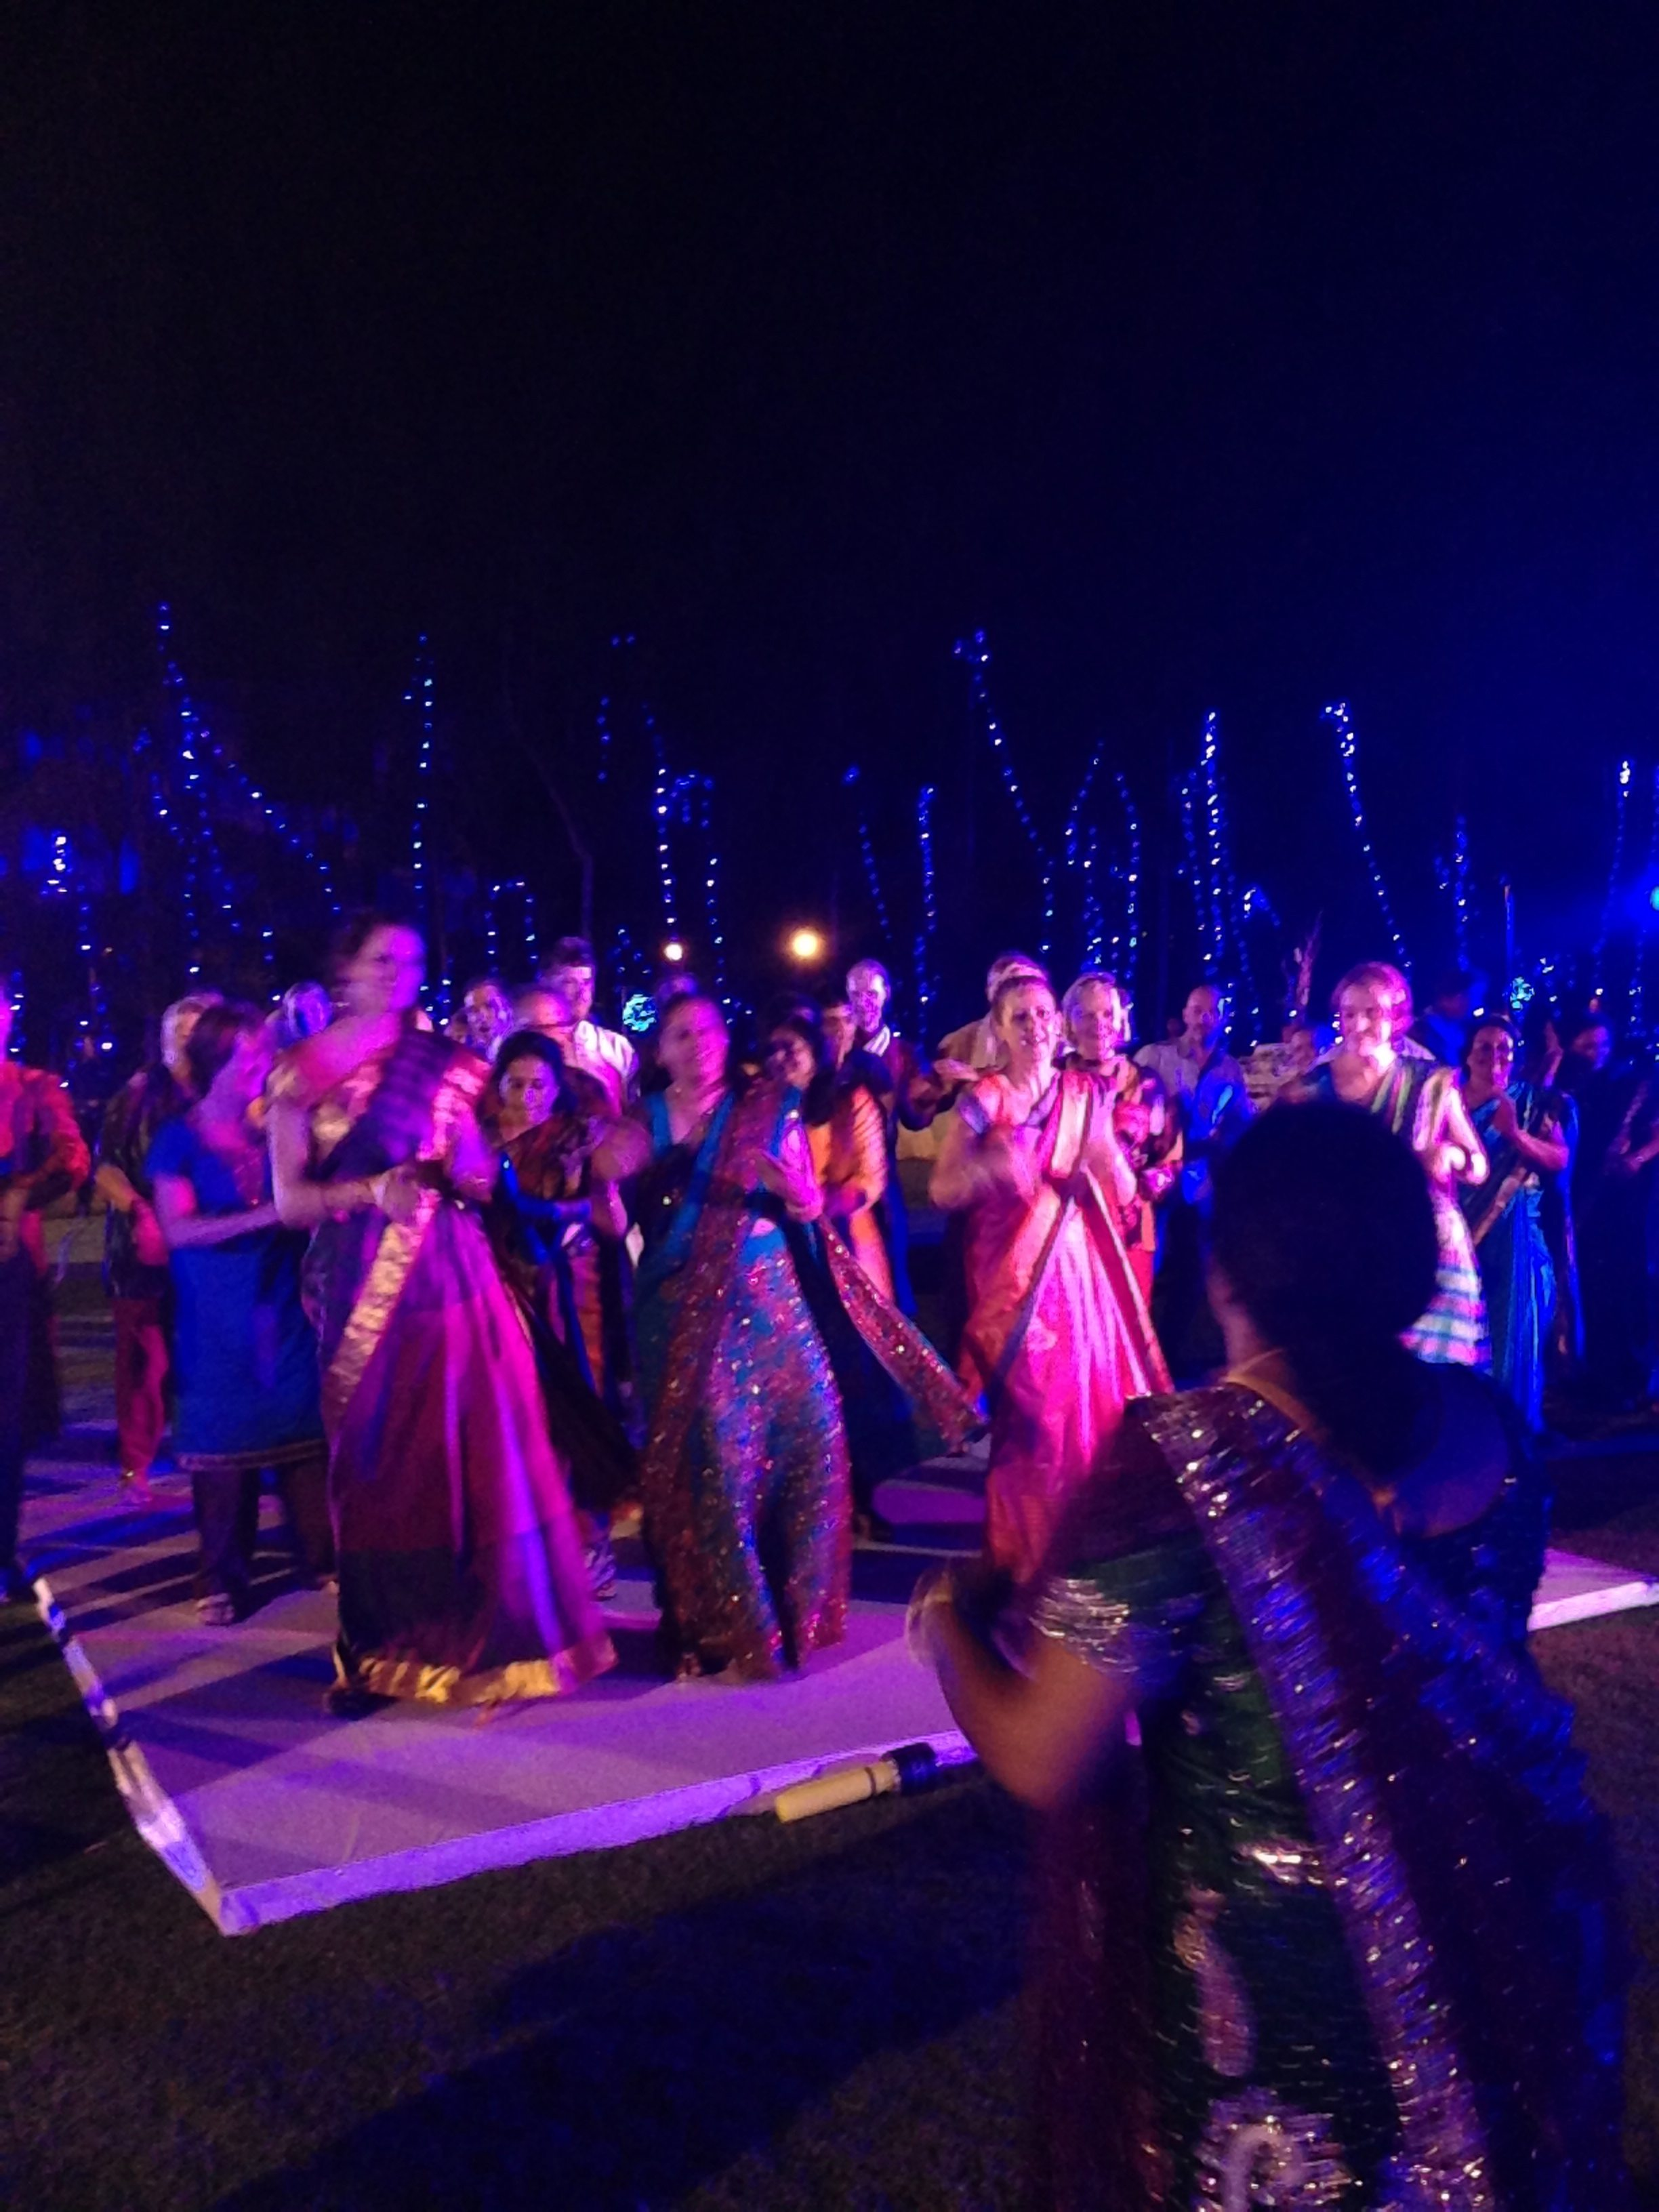 The Big Fat Indian Wedding : Shaadi Time